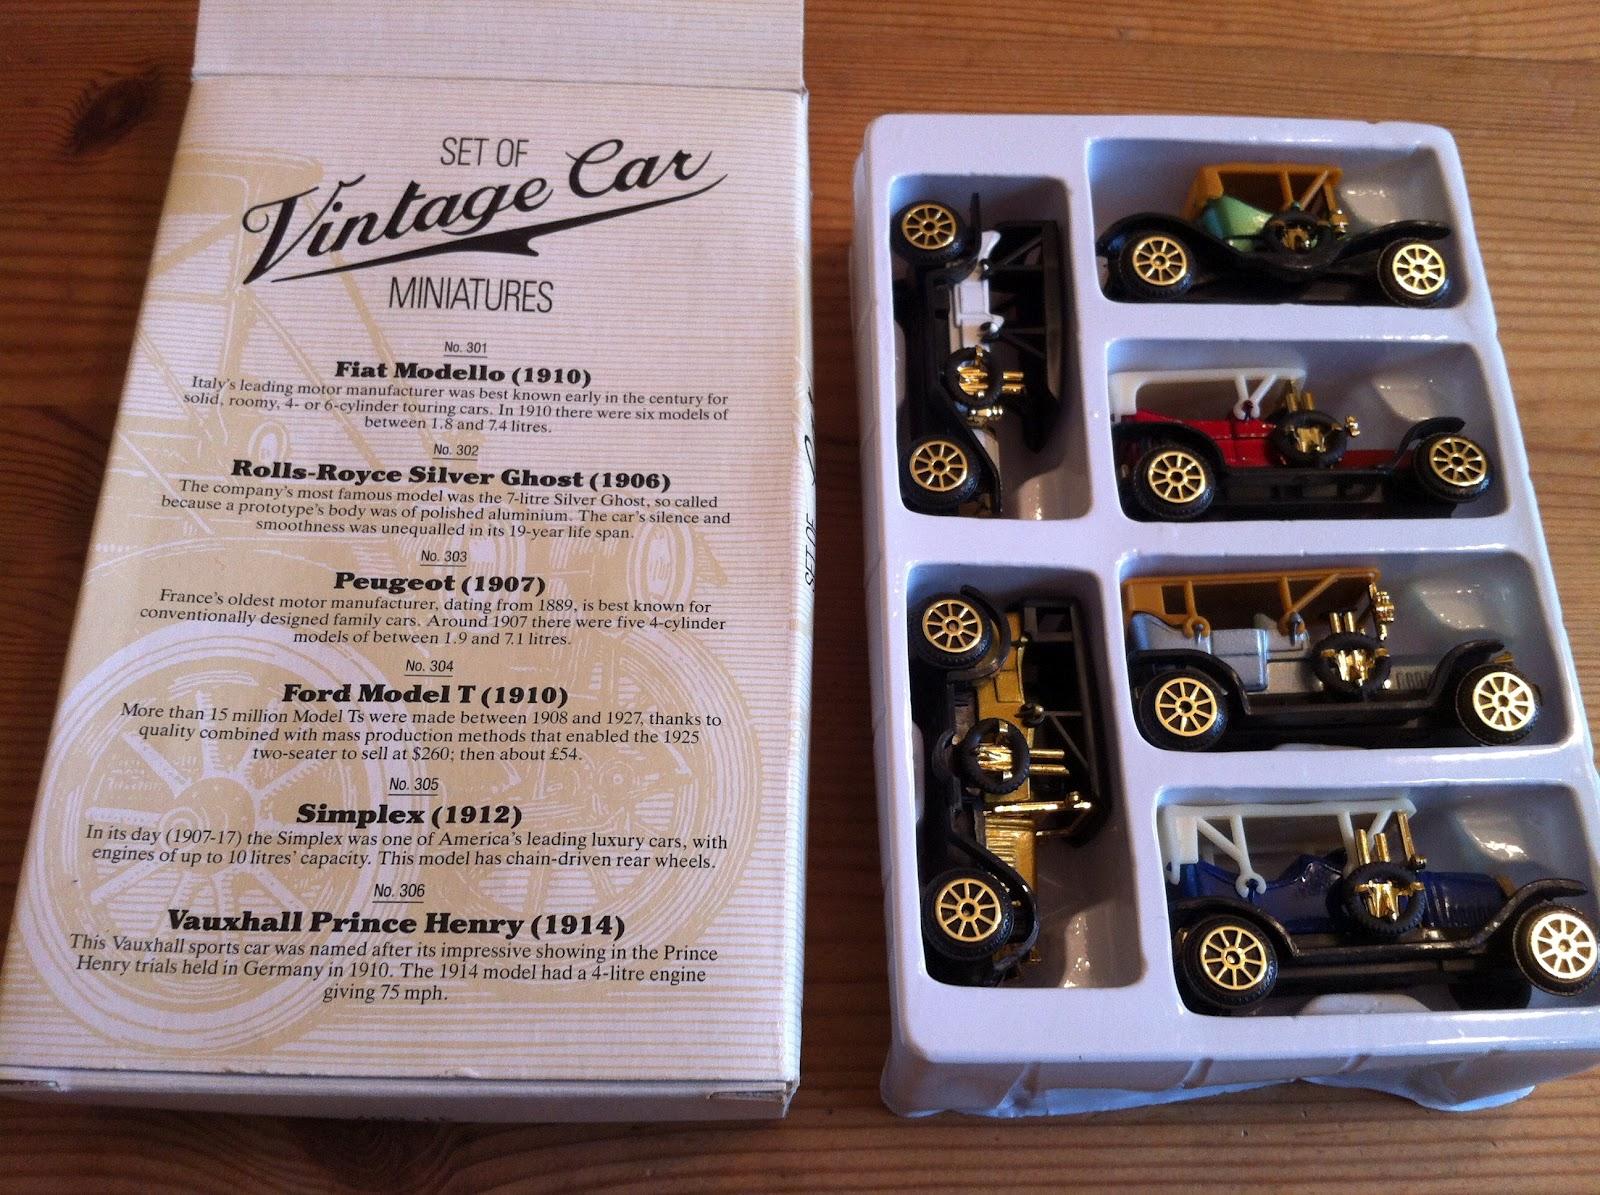 Phil Treagus eBay: Readers Digest: Set of Vintage Car Miniatures